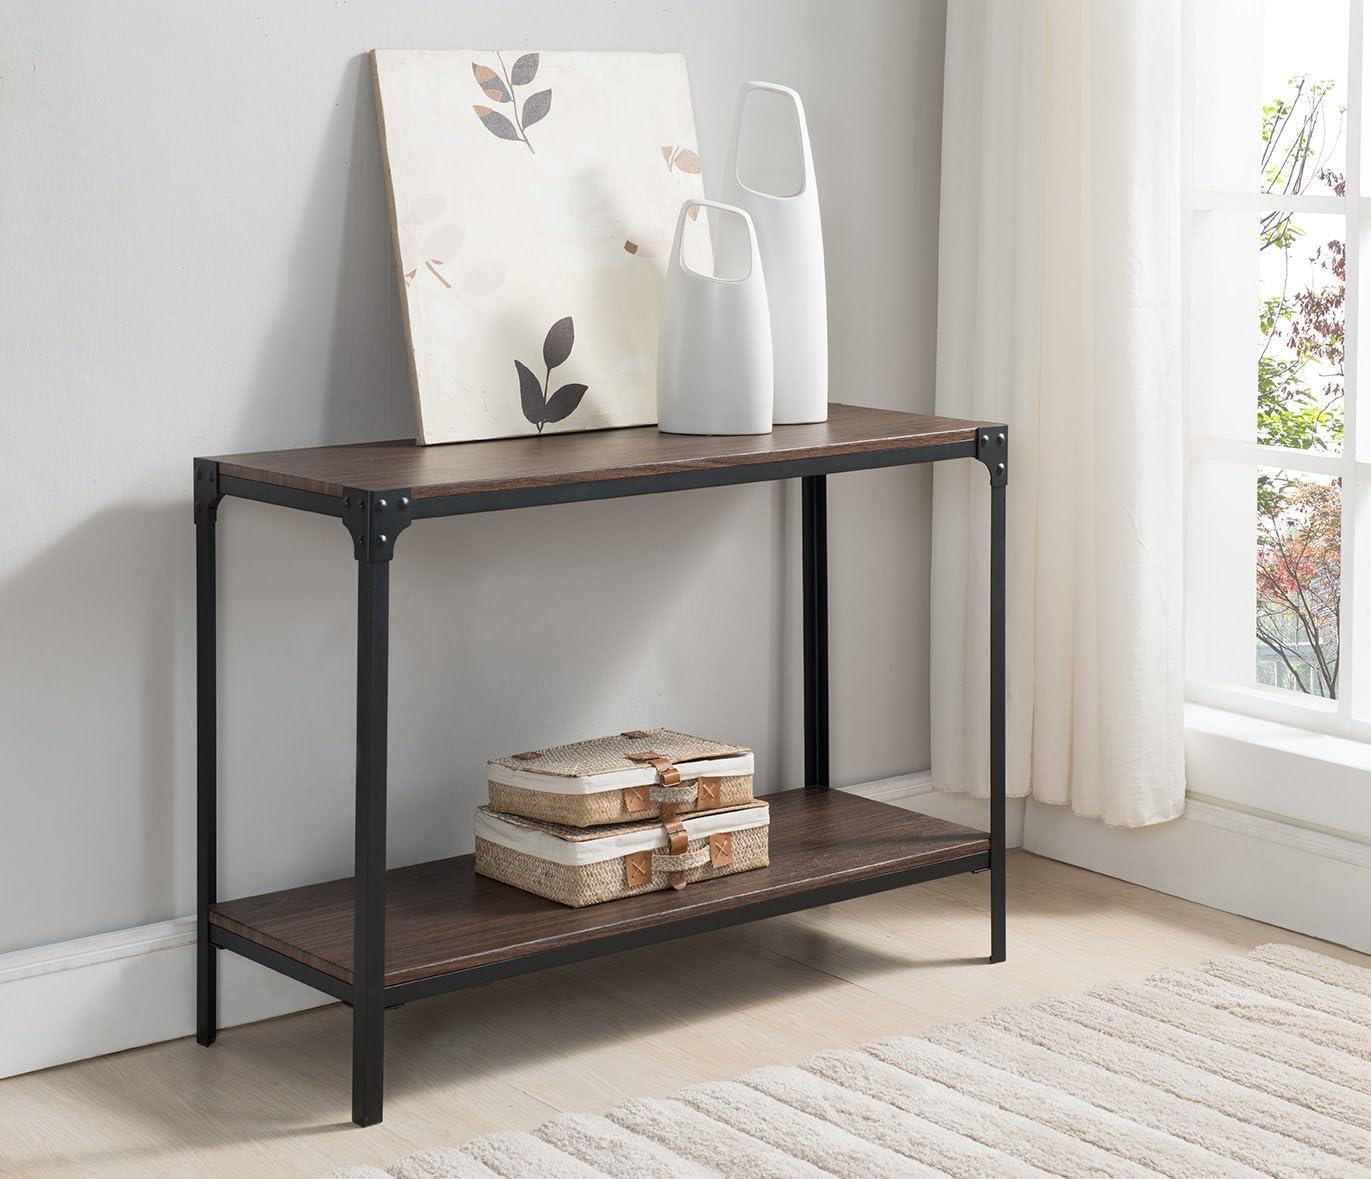 Kings Brand Furniture – Lorenzo Antique Finish Console Sofa Table, Black Walnut